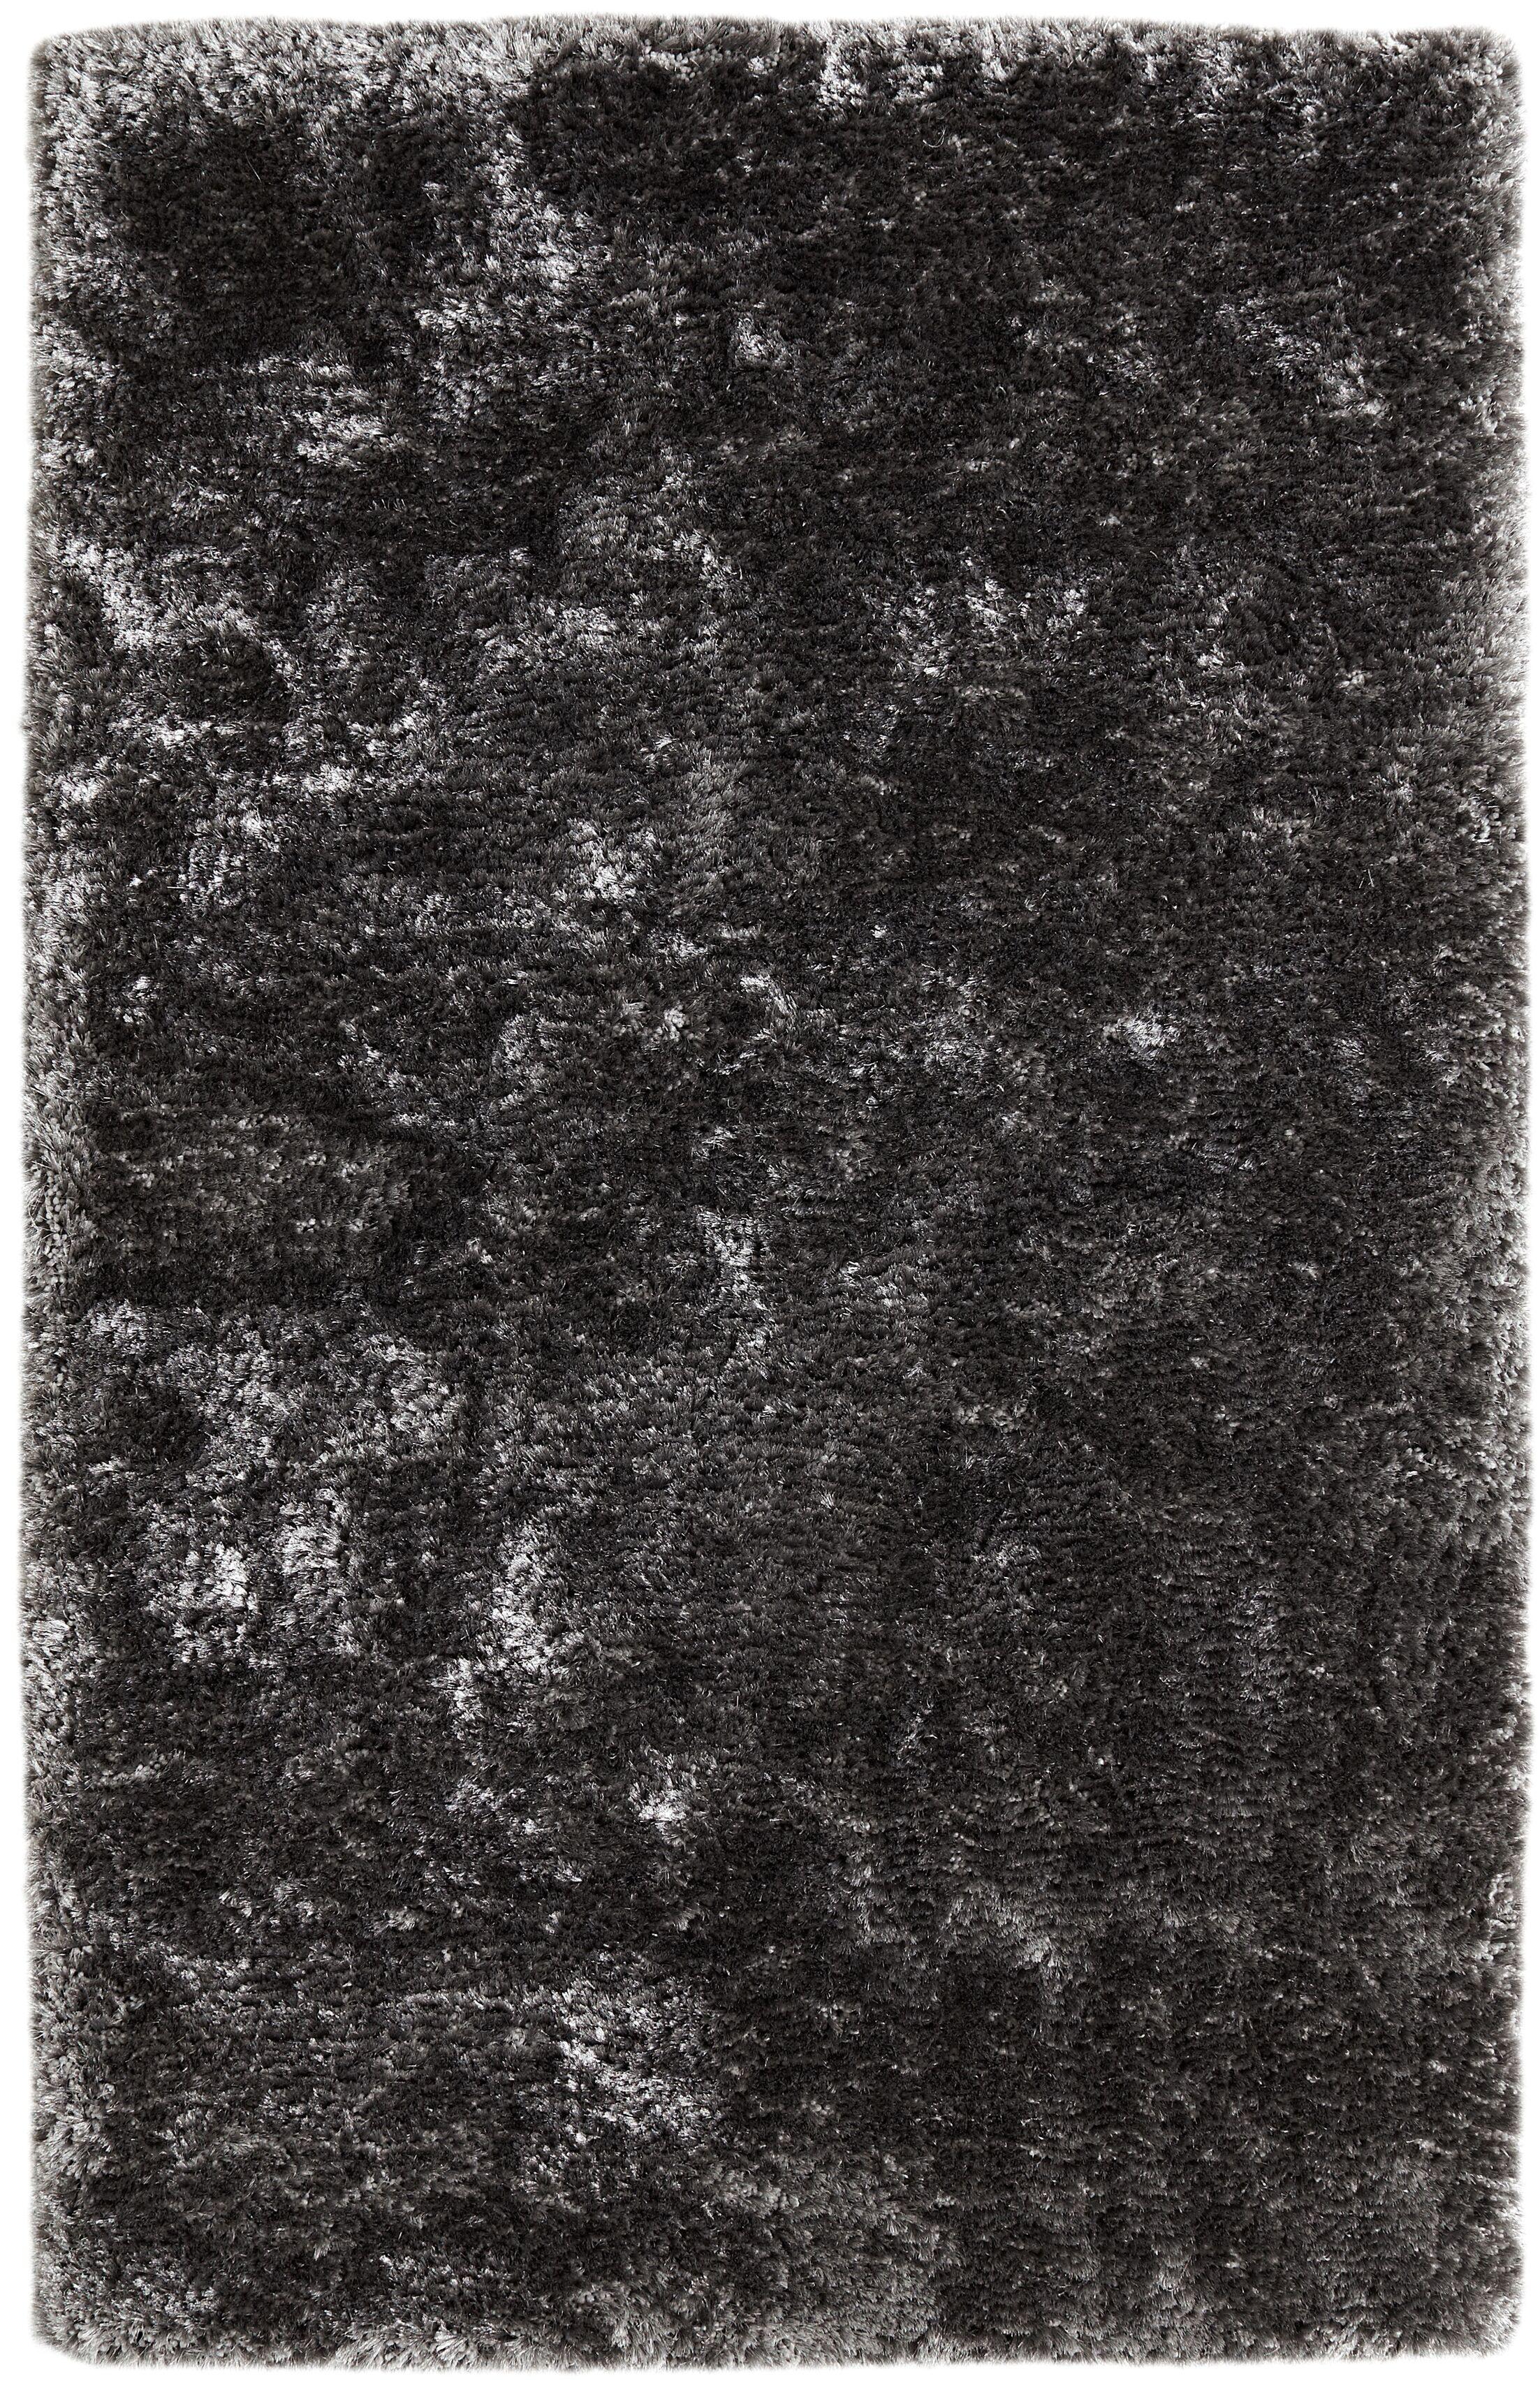 Saint Black Area Rug Rug Size: Rectangle 8' x 10'